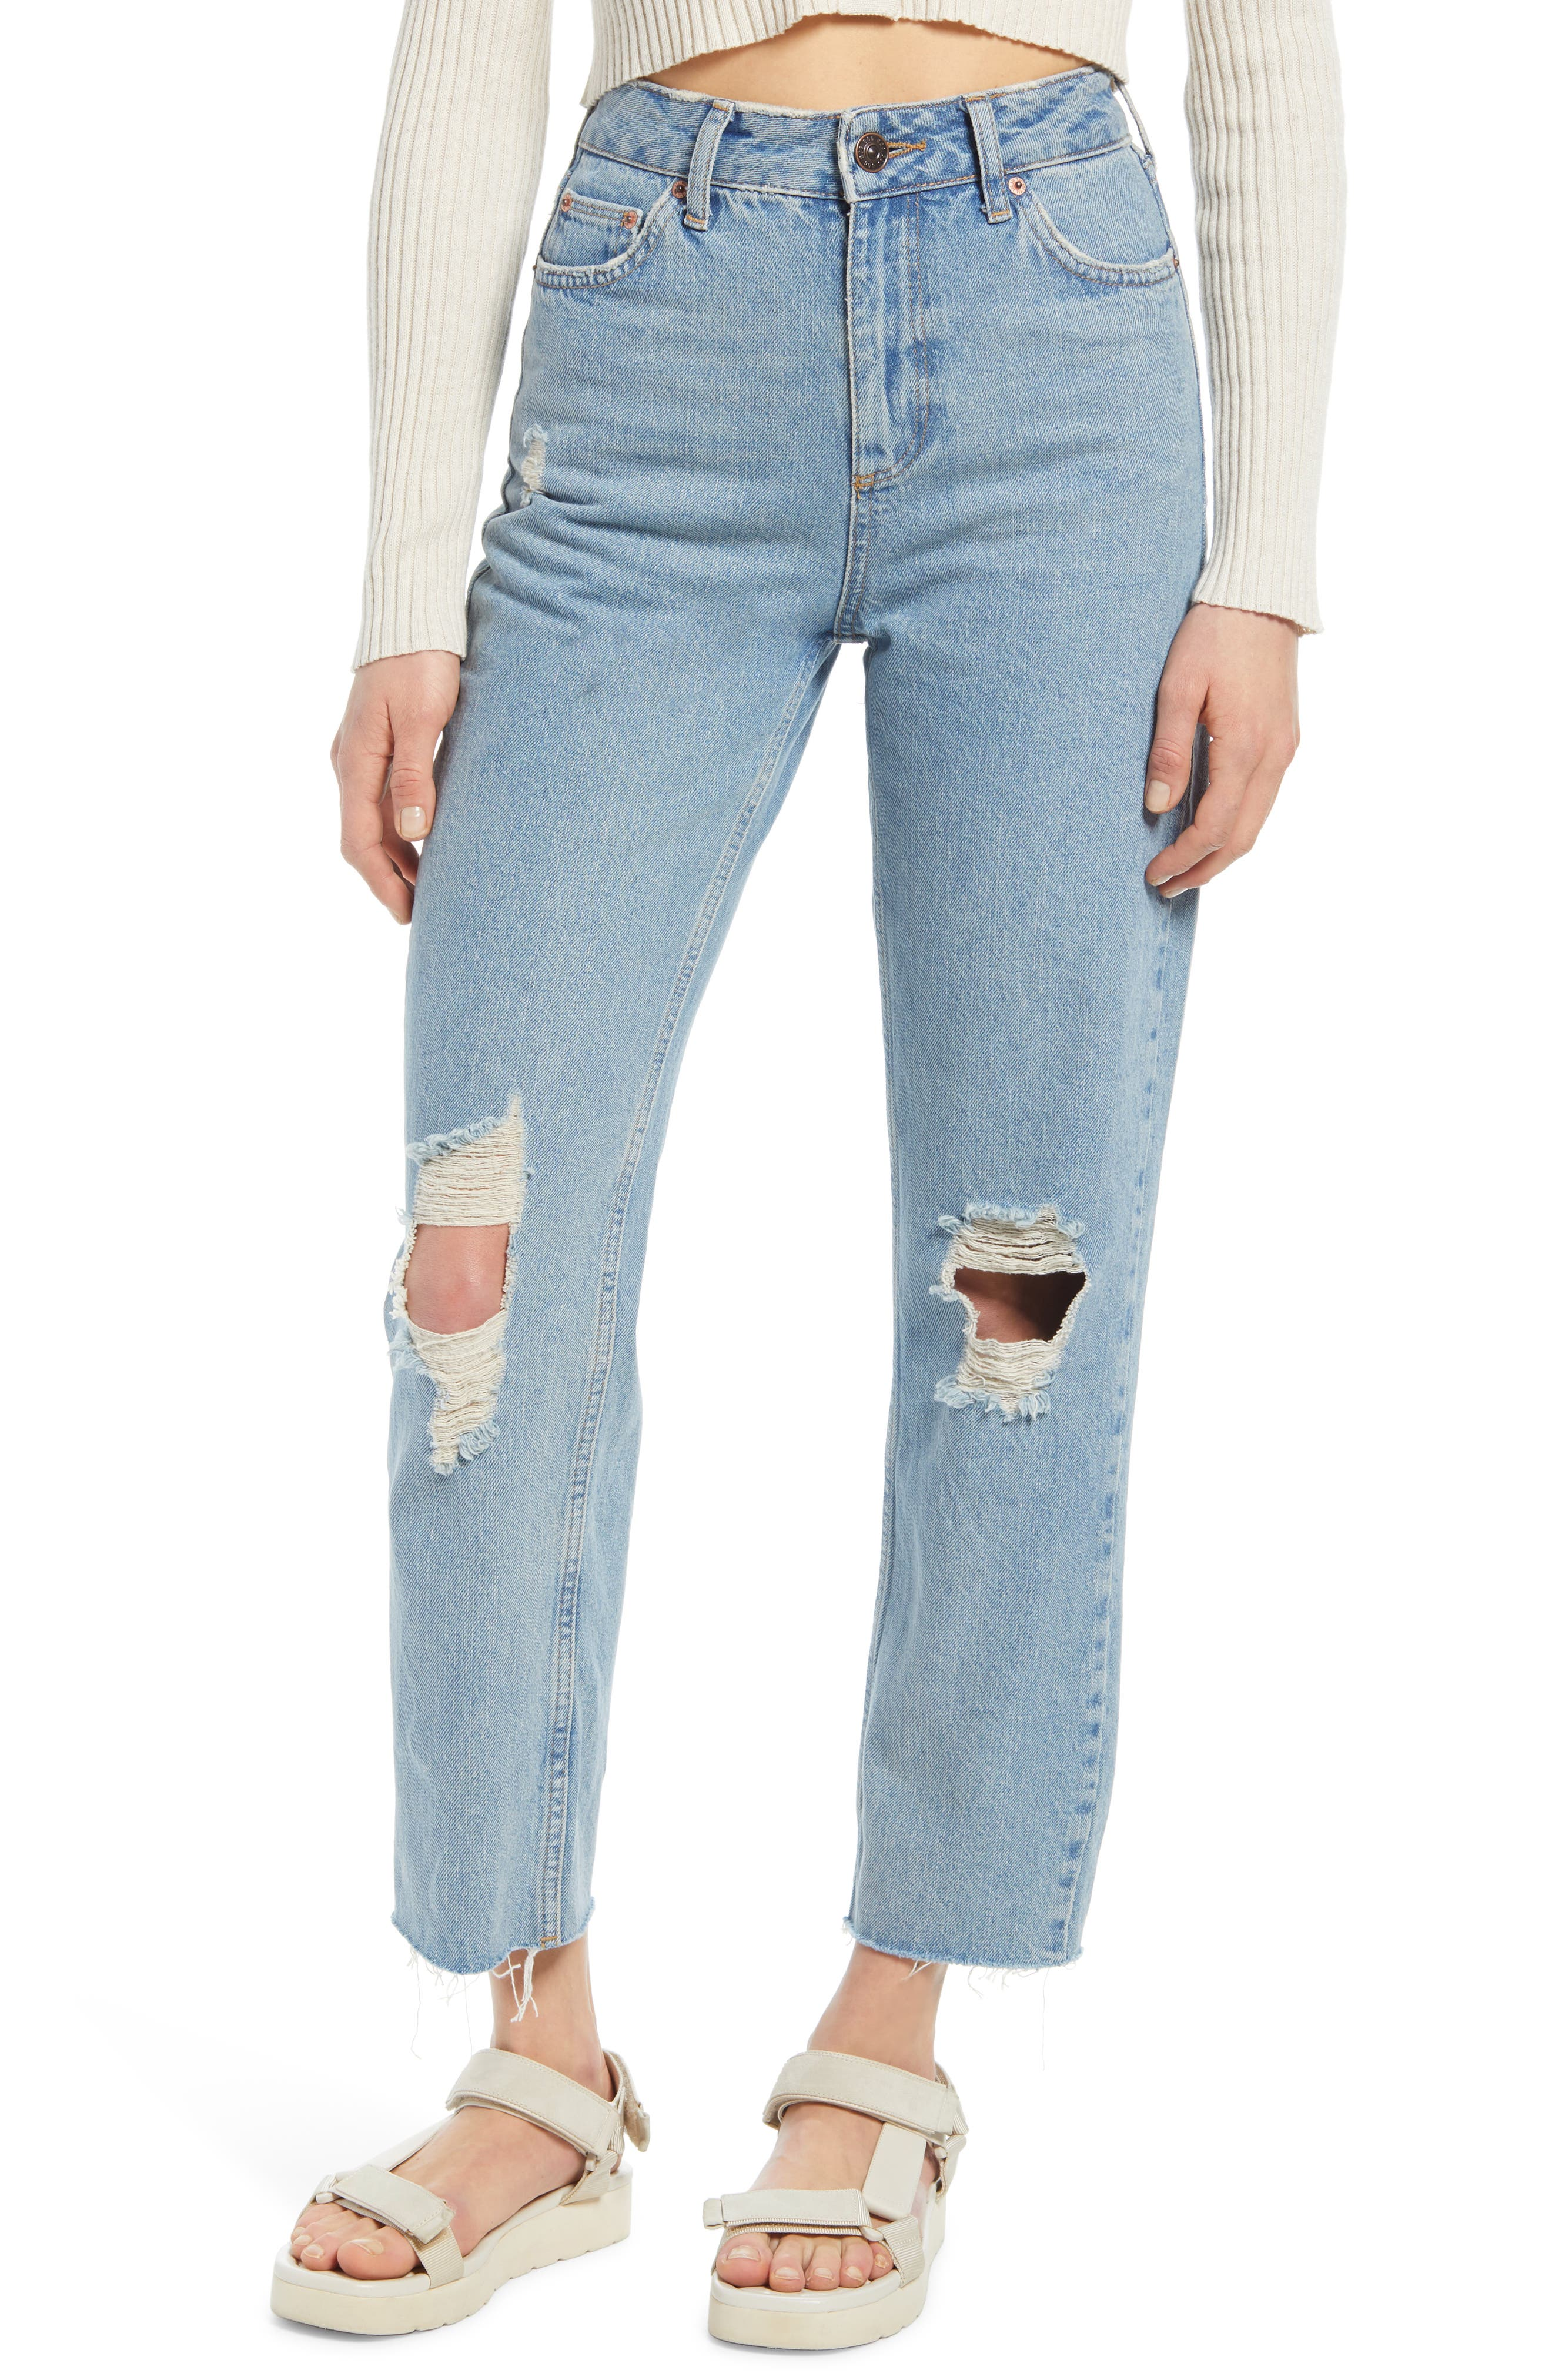 Pax Ripped High Waist Jeans